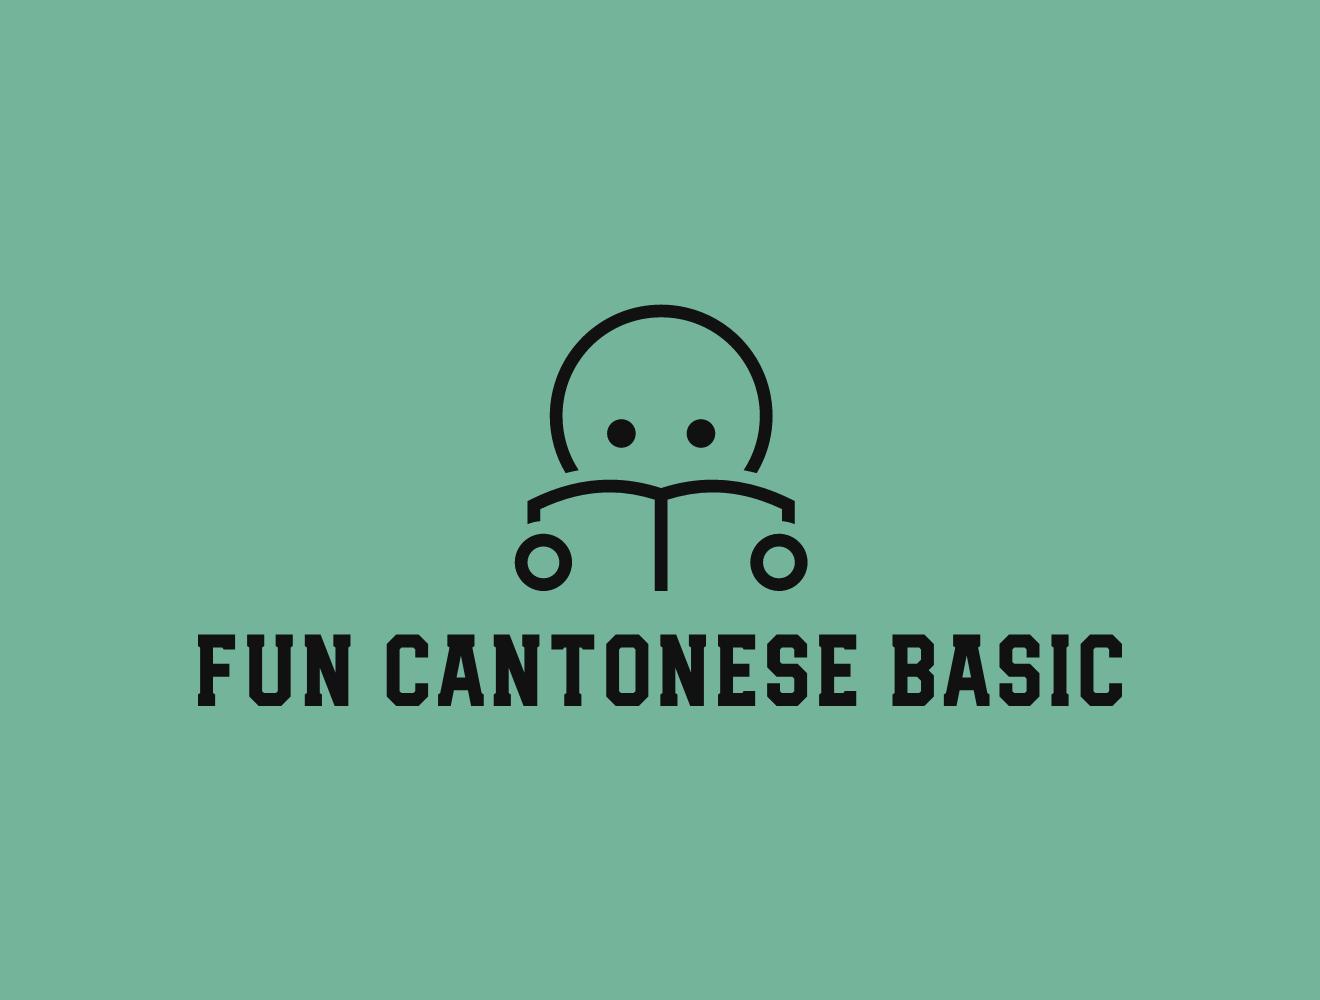 Fun Cantonese Basic | Vancouver Cantonese Language School